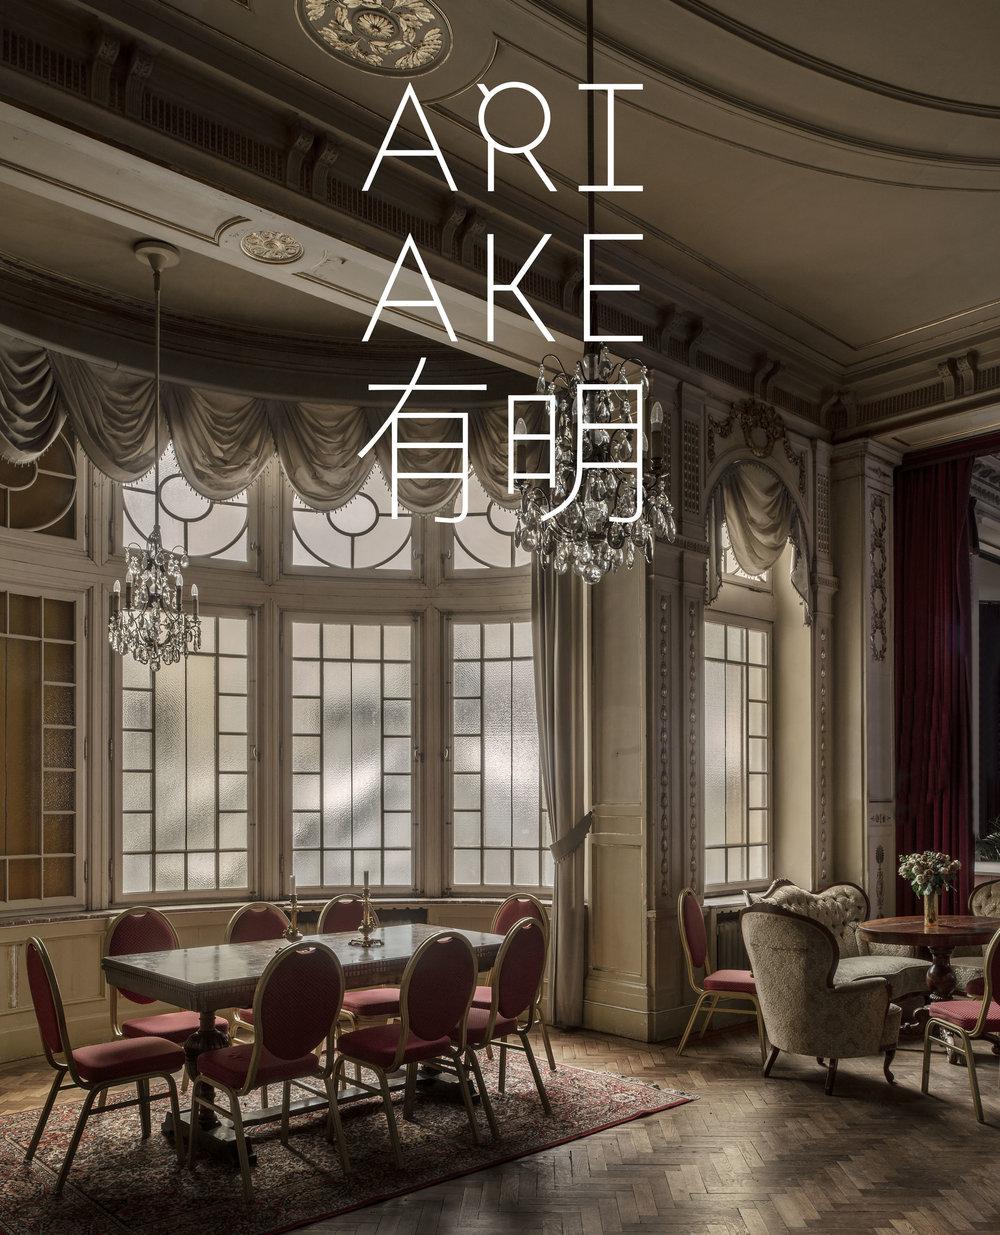 Ariake STockholm.jpg